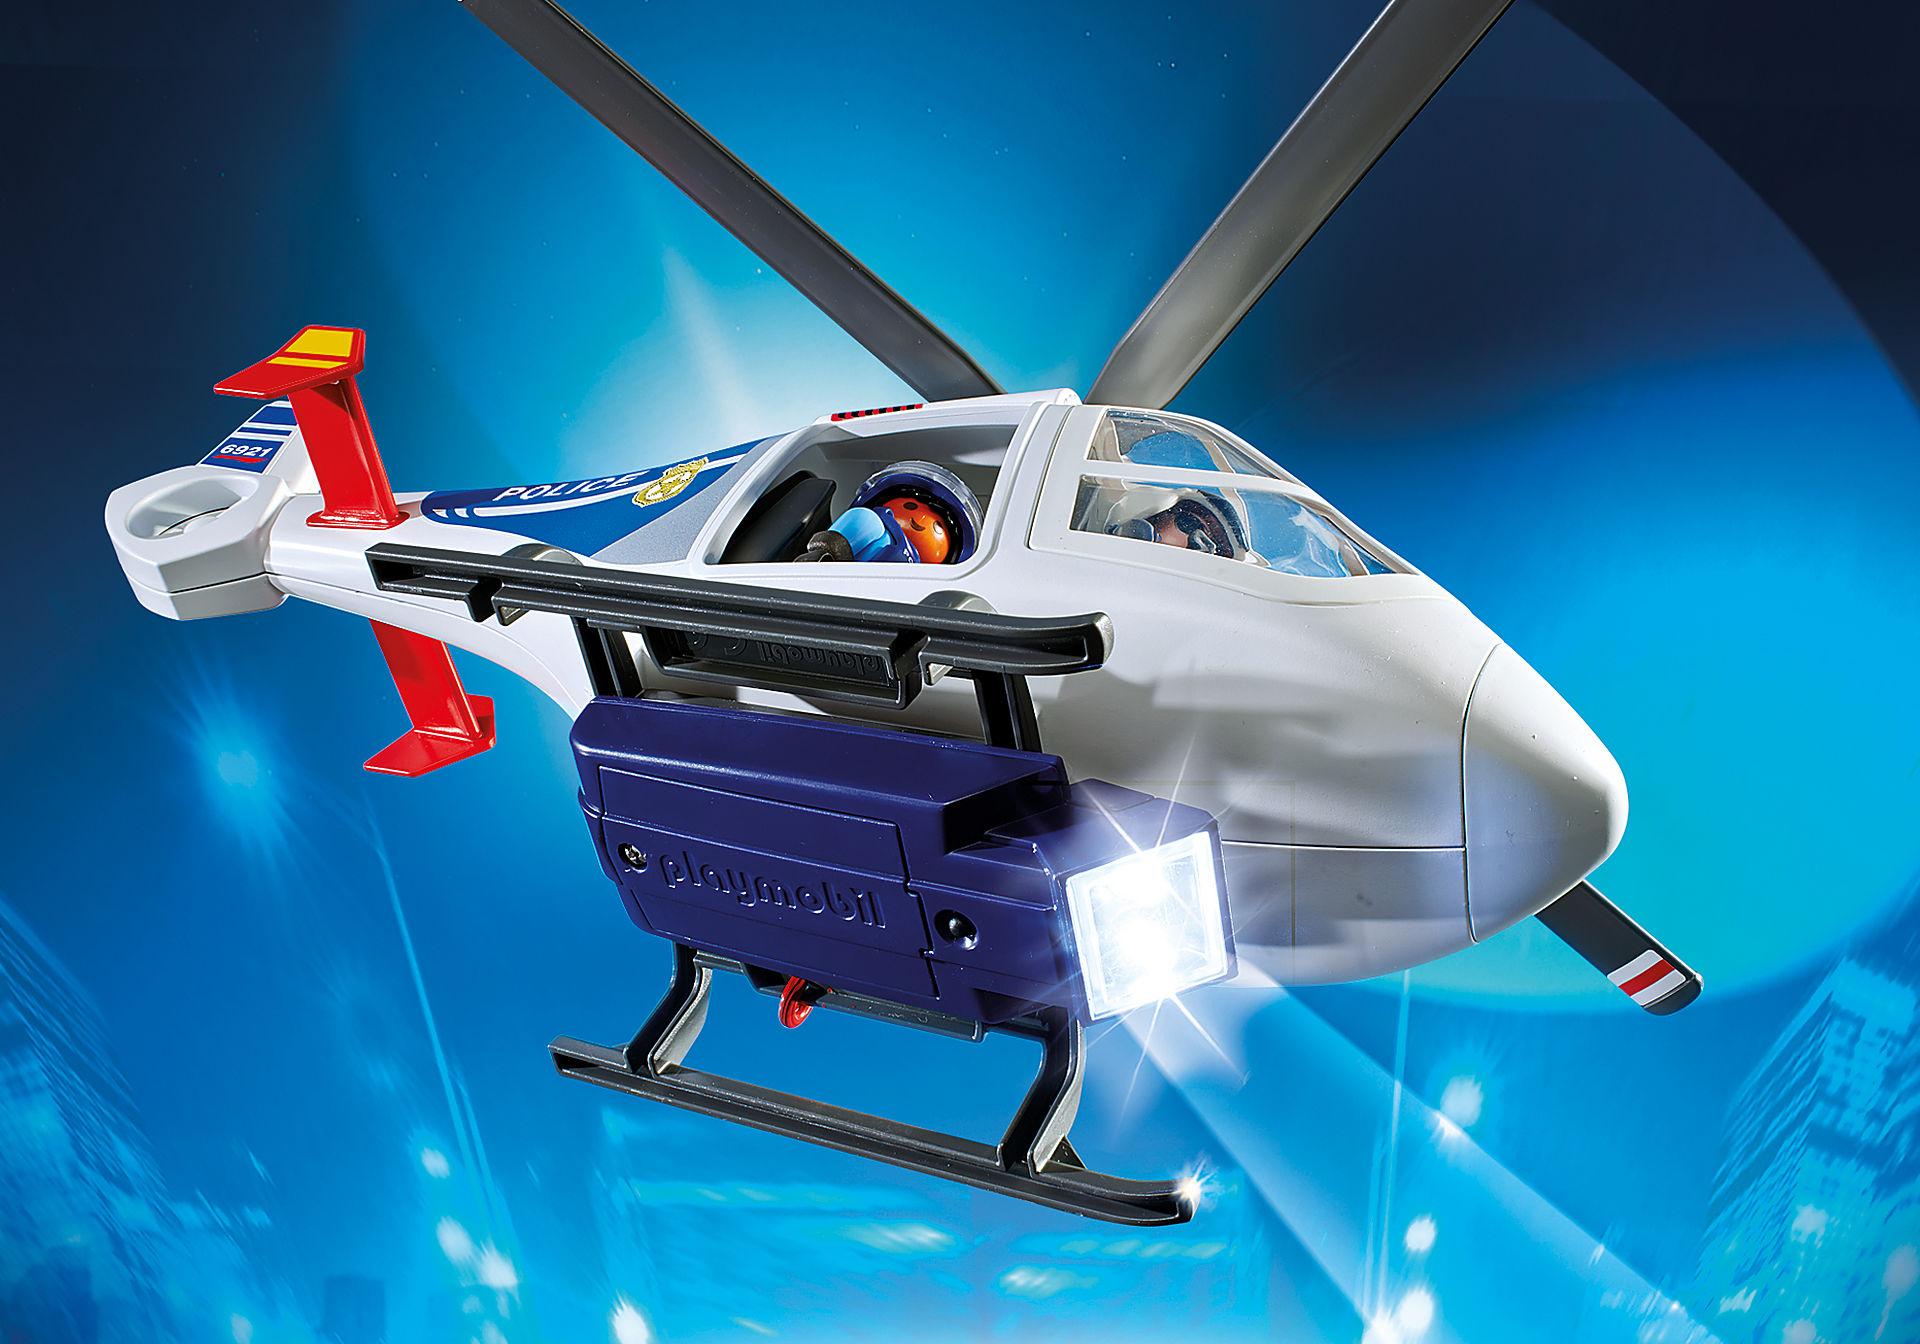 6921 Helicóptero de Policía con Luces LED zoom image6